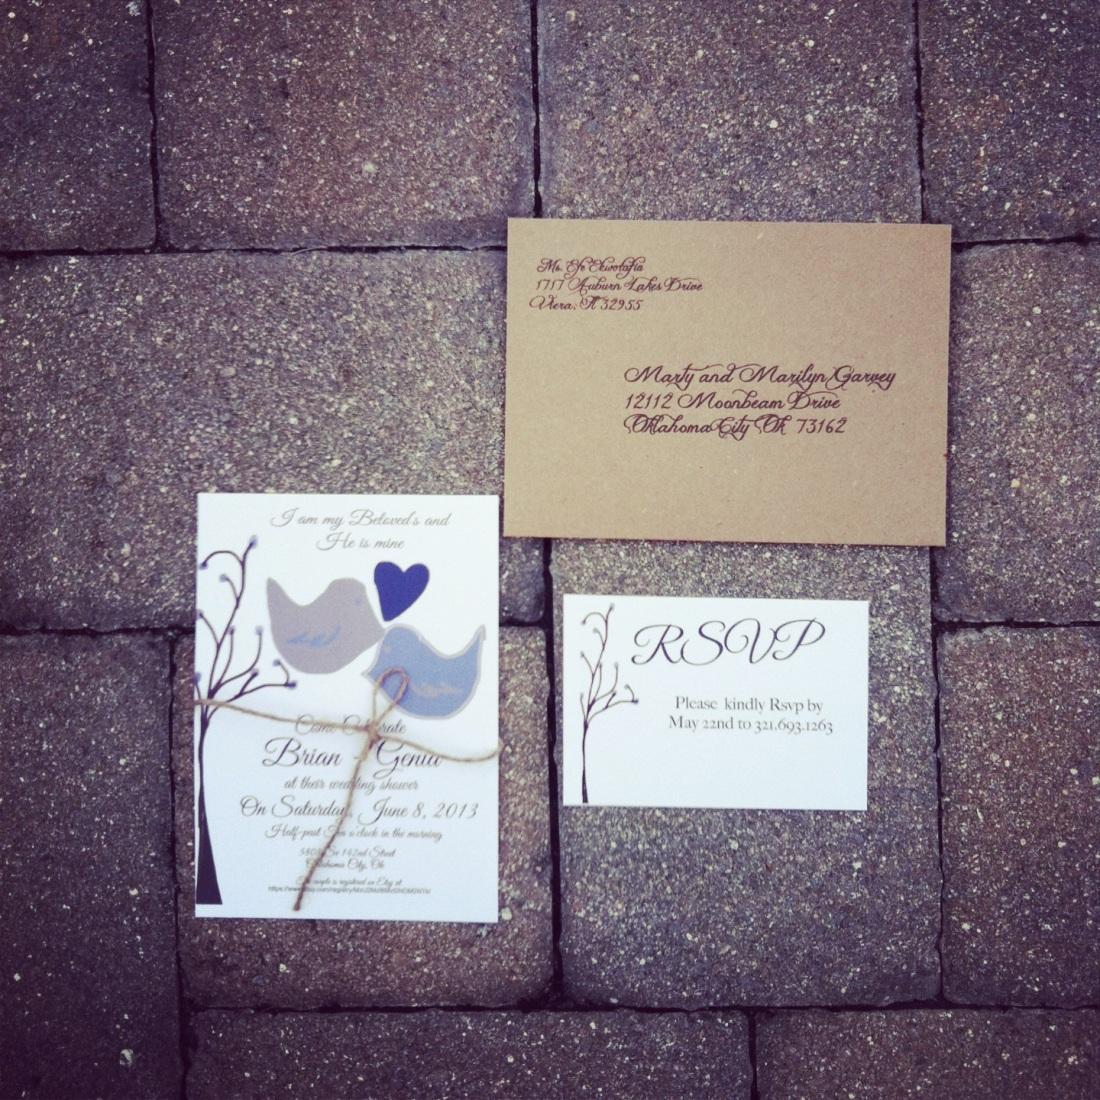 My beloved wedding shower invitations